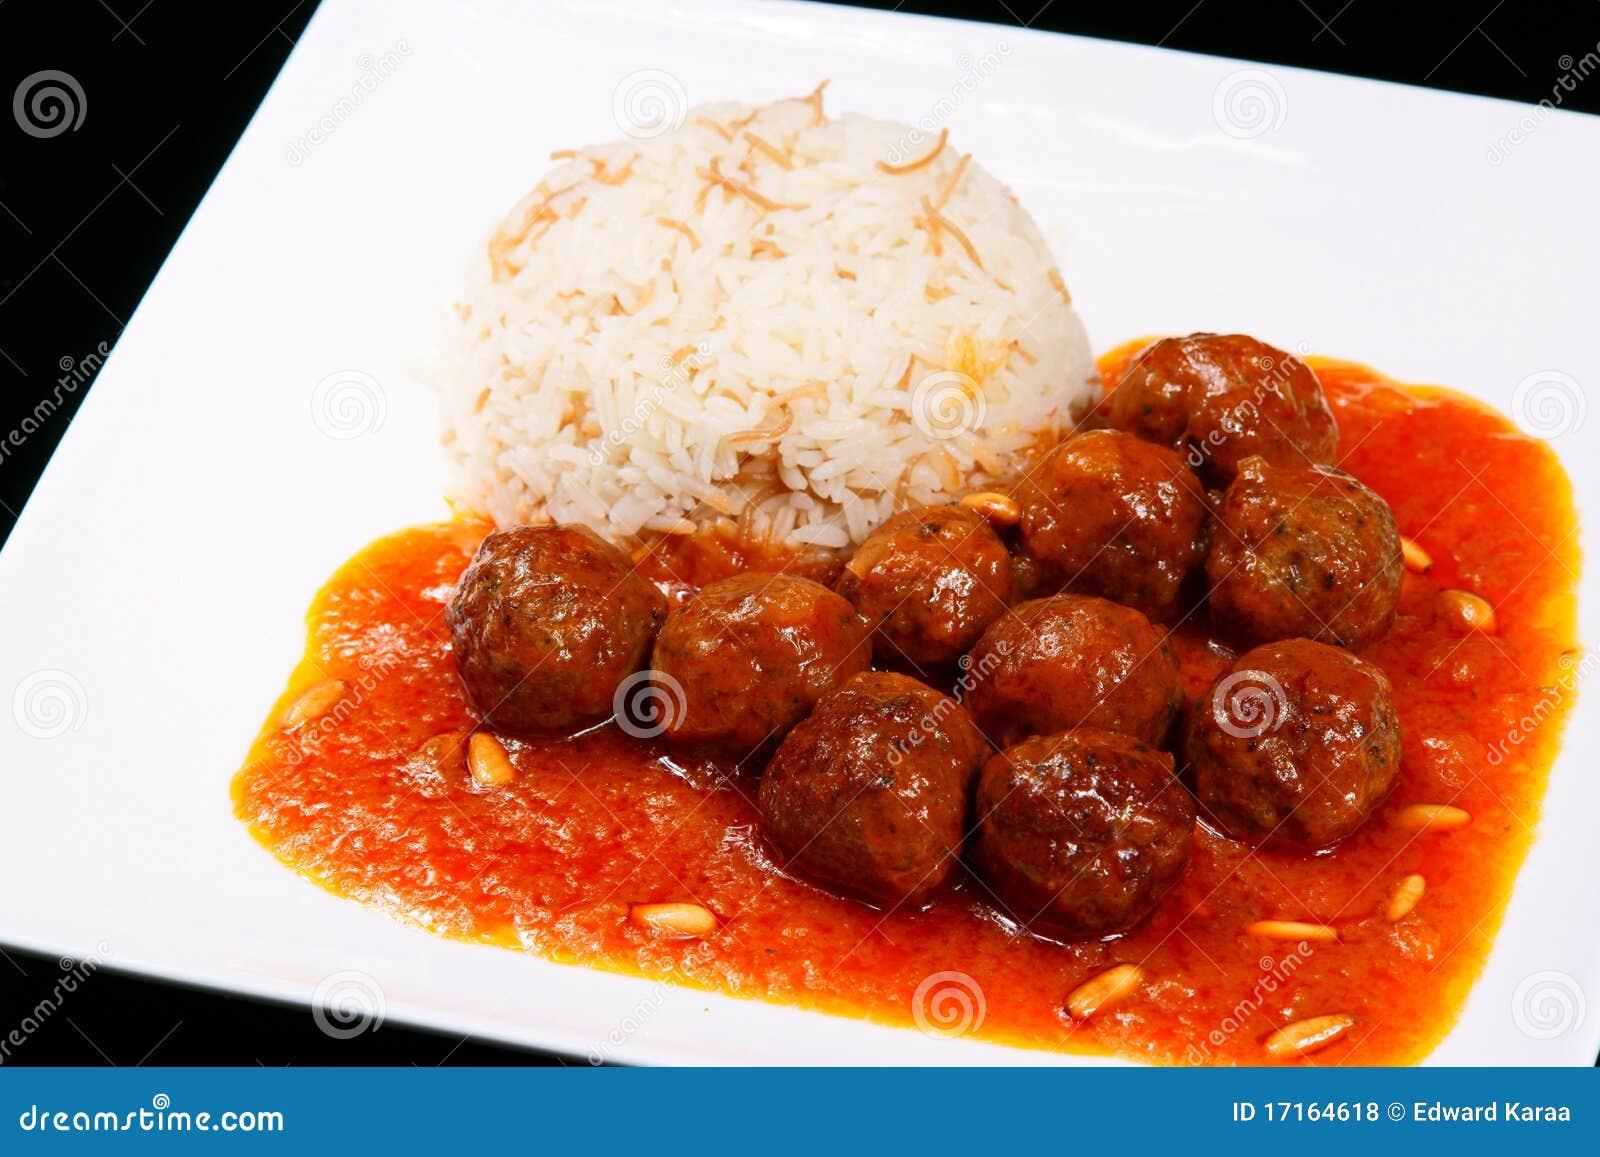 Dawoud pasha lebanese food royalty free stock photos for About lebanese cuisine